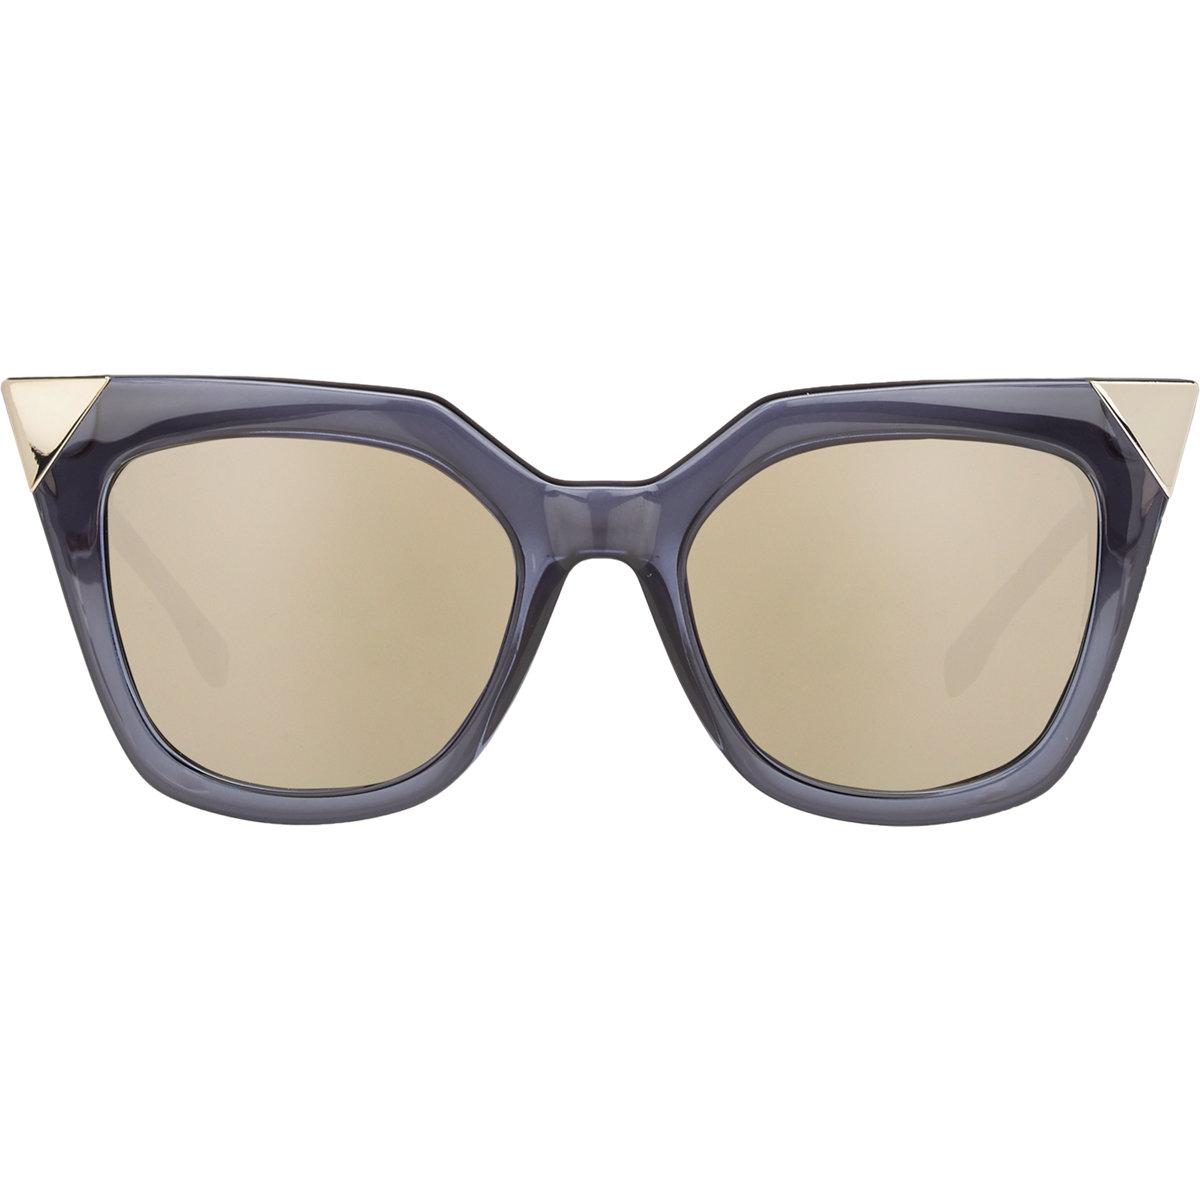 140437f5f5ed Fendi Iridia Sunglasses - Lyst